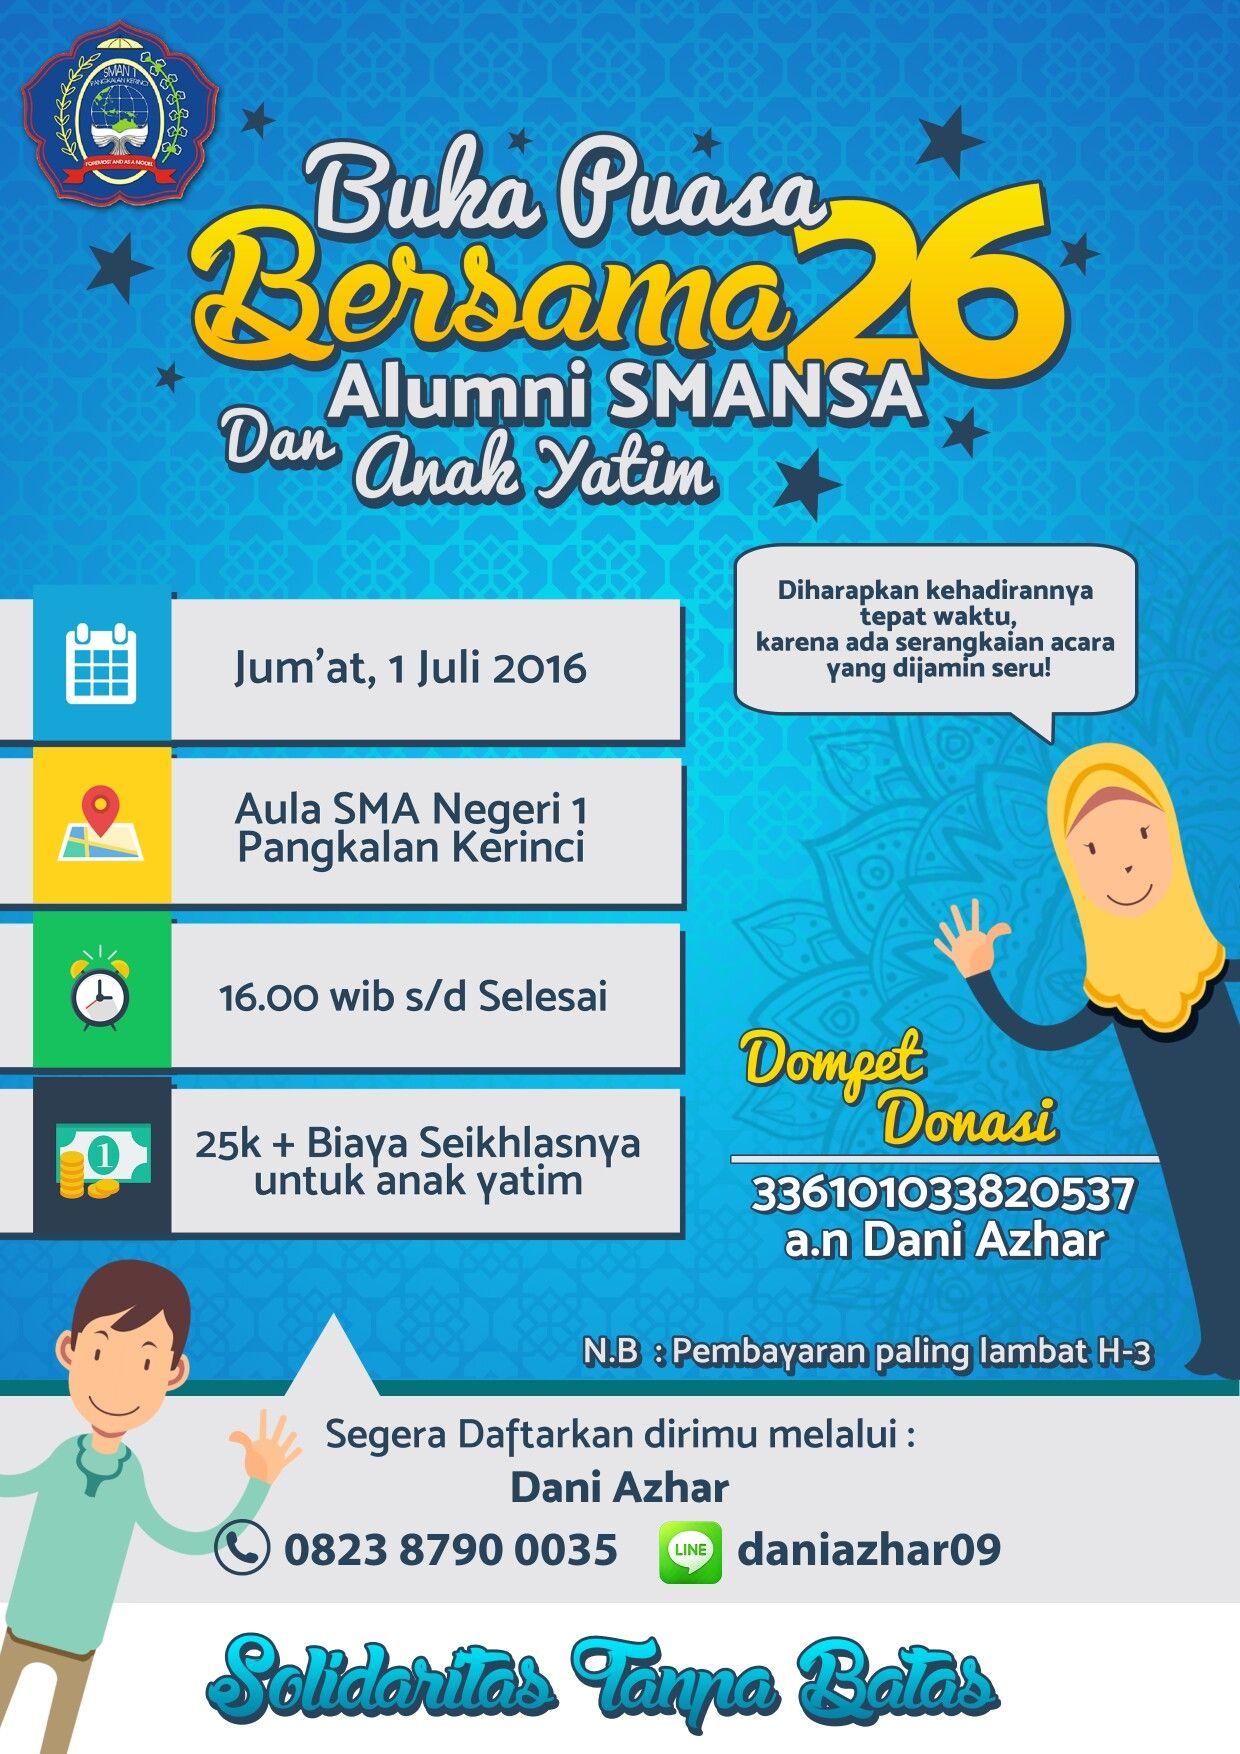 Design Flyer Buka Puasa Bersama With Photoshop Cc Desain Pamflet